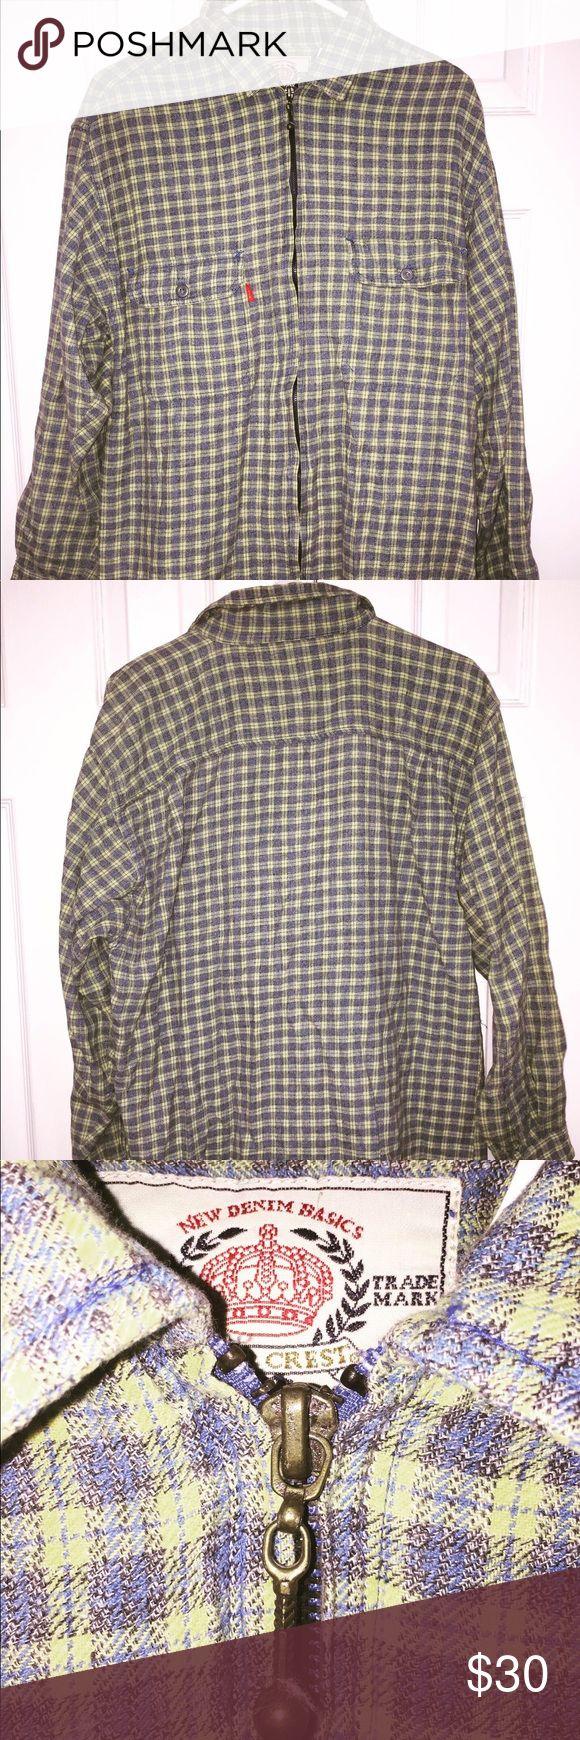 Vintage Bugle Boy Gold Crest Flannel Shirt. Pre-owned. Normal wear.  Zip front. …